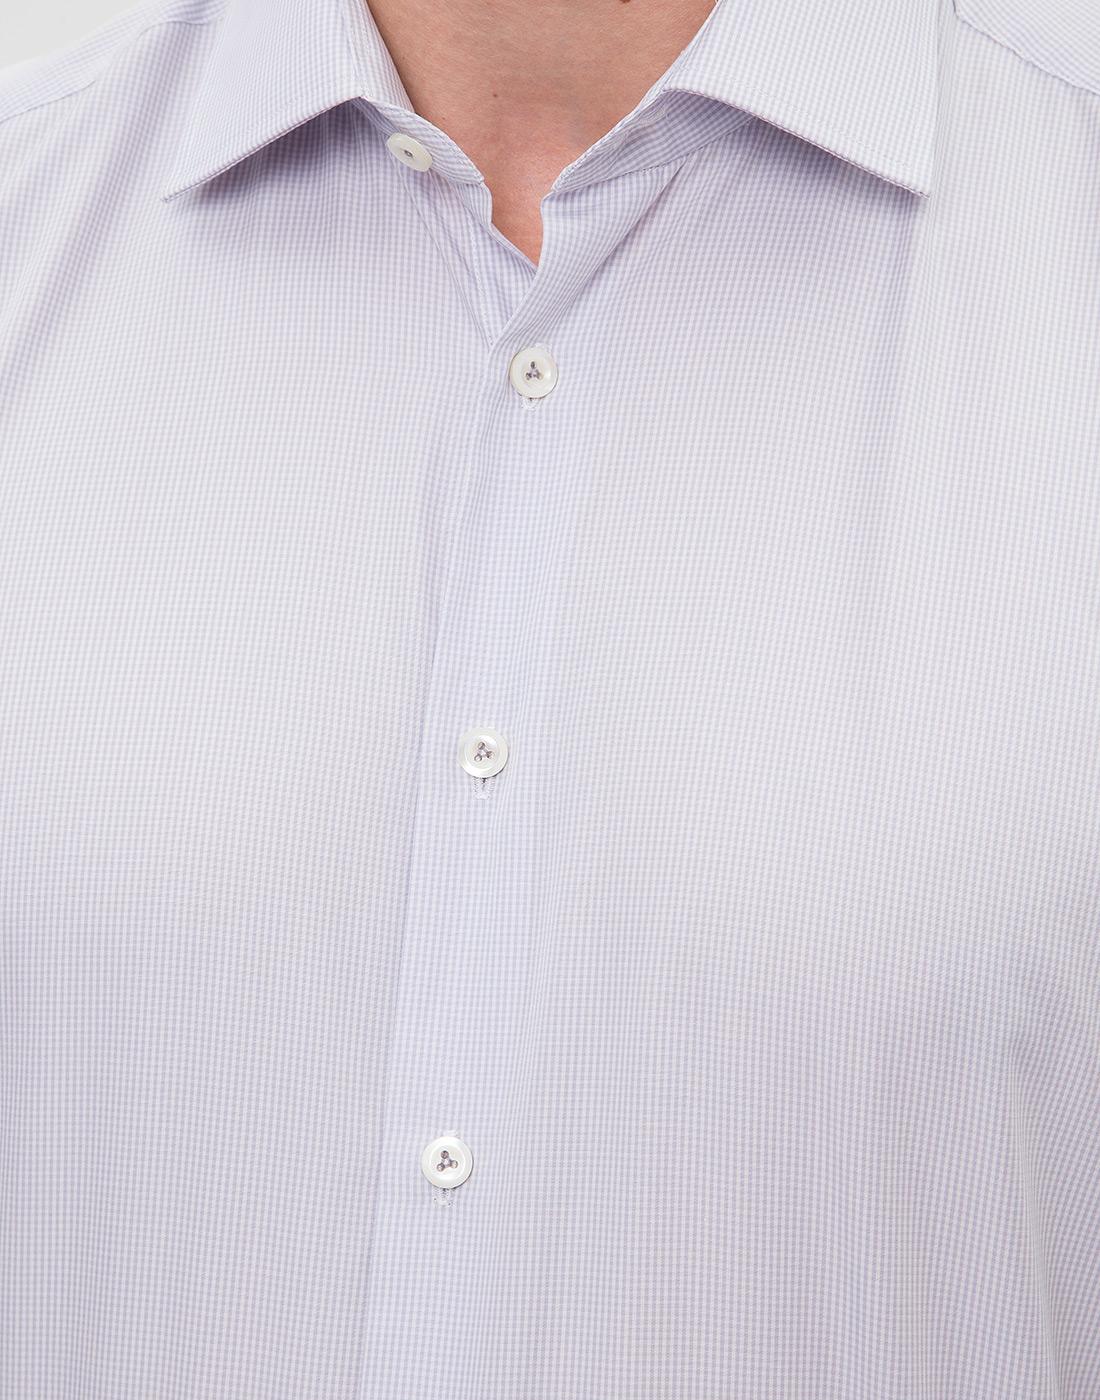 Мужская сиреневая рубашка Van Laack S163209/020-6